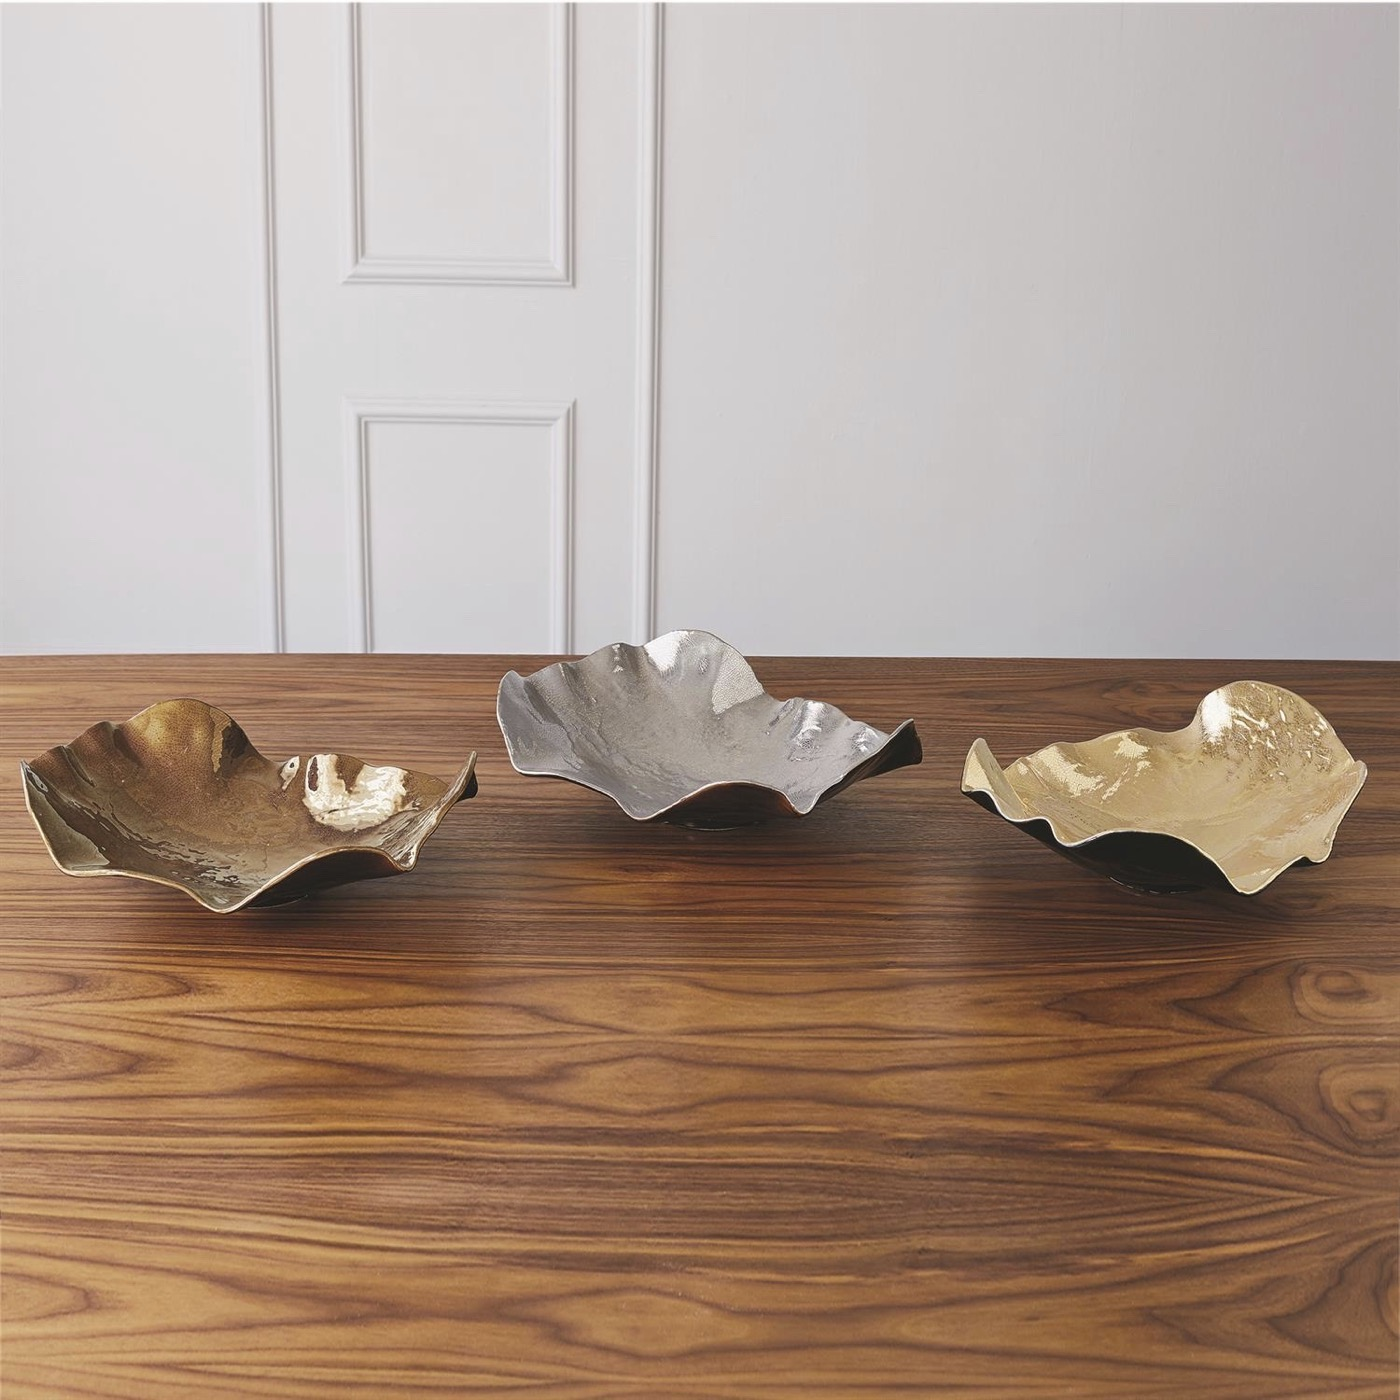 Ruffalo Ceramic Bowl | Bronze